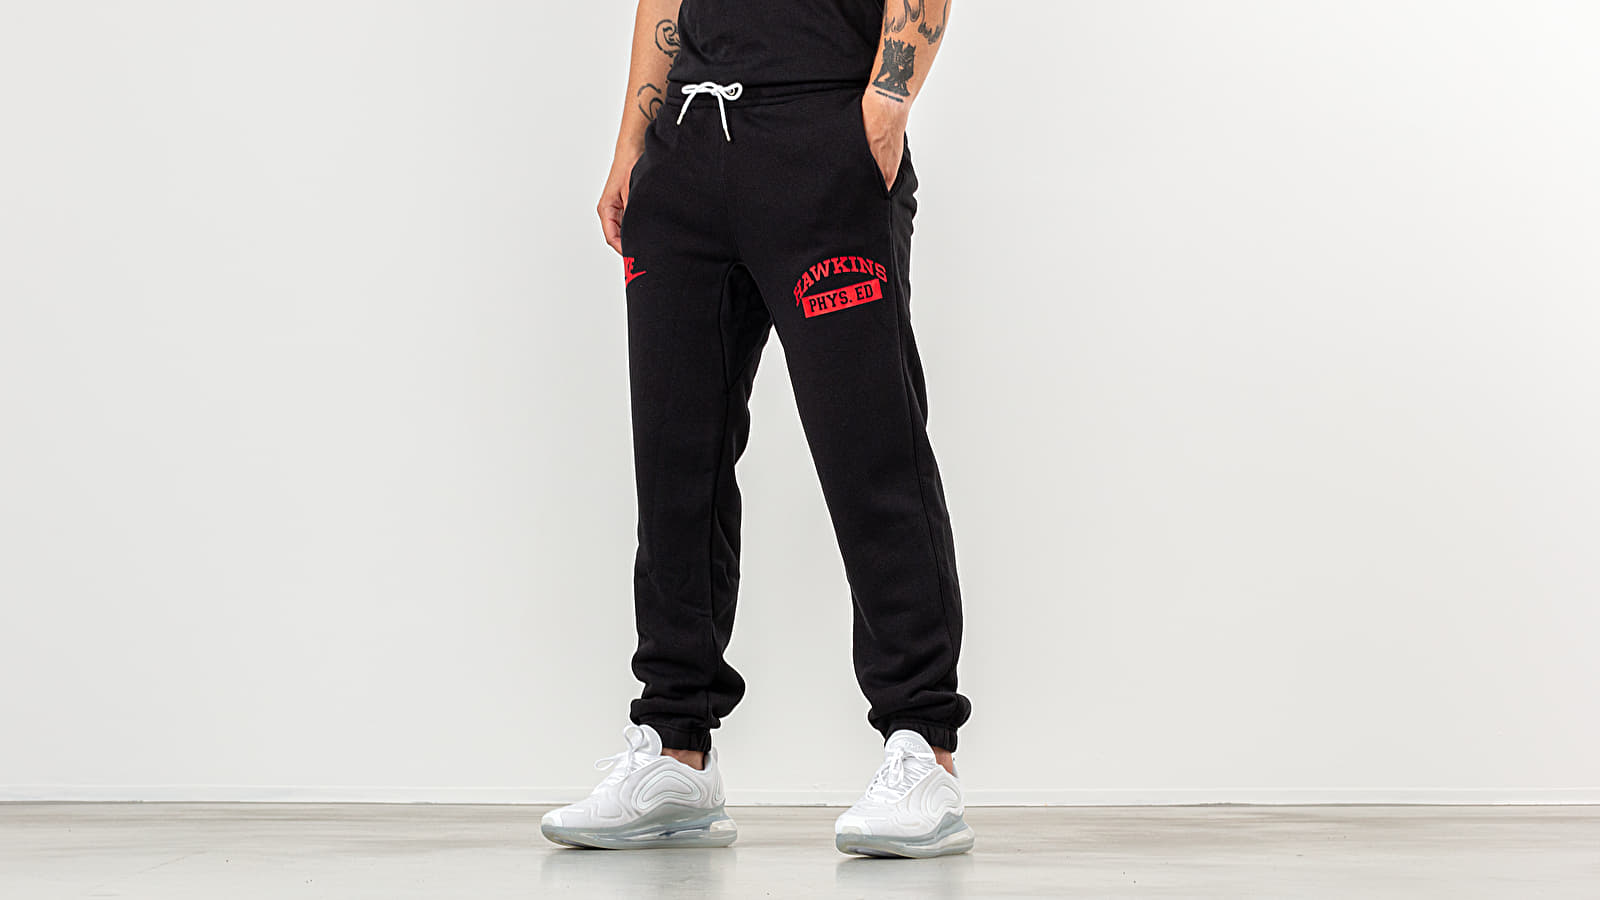 18c74ad2 Nike x Stranger Things NRG Club Pants Black/ White/ University Red ...